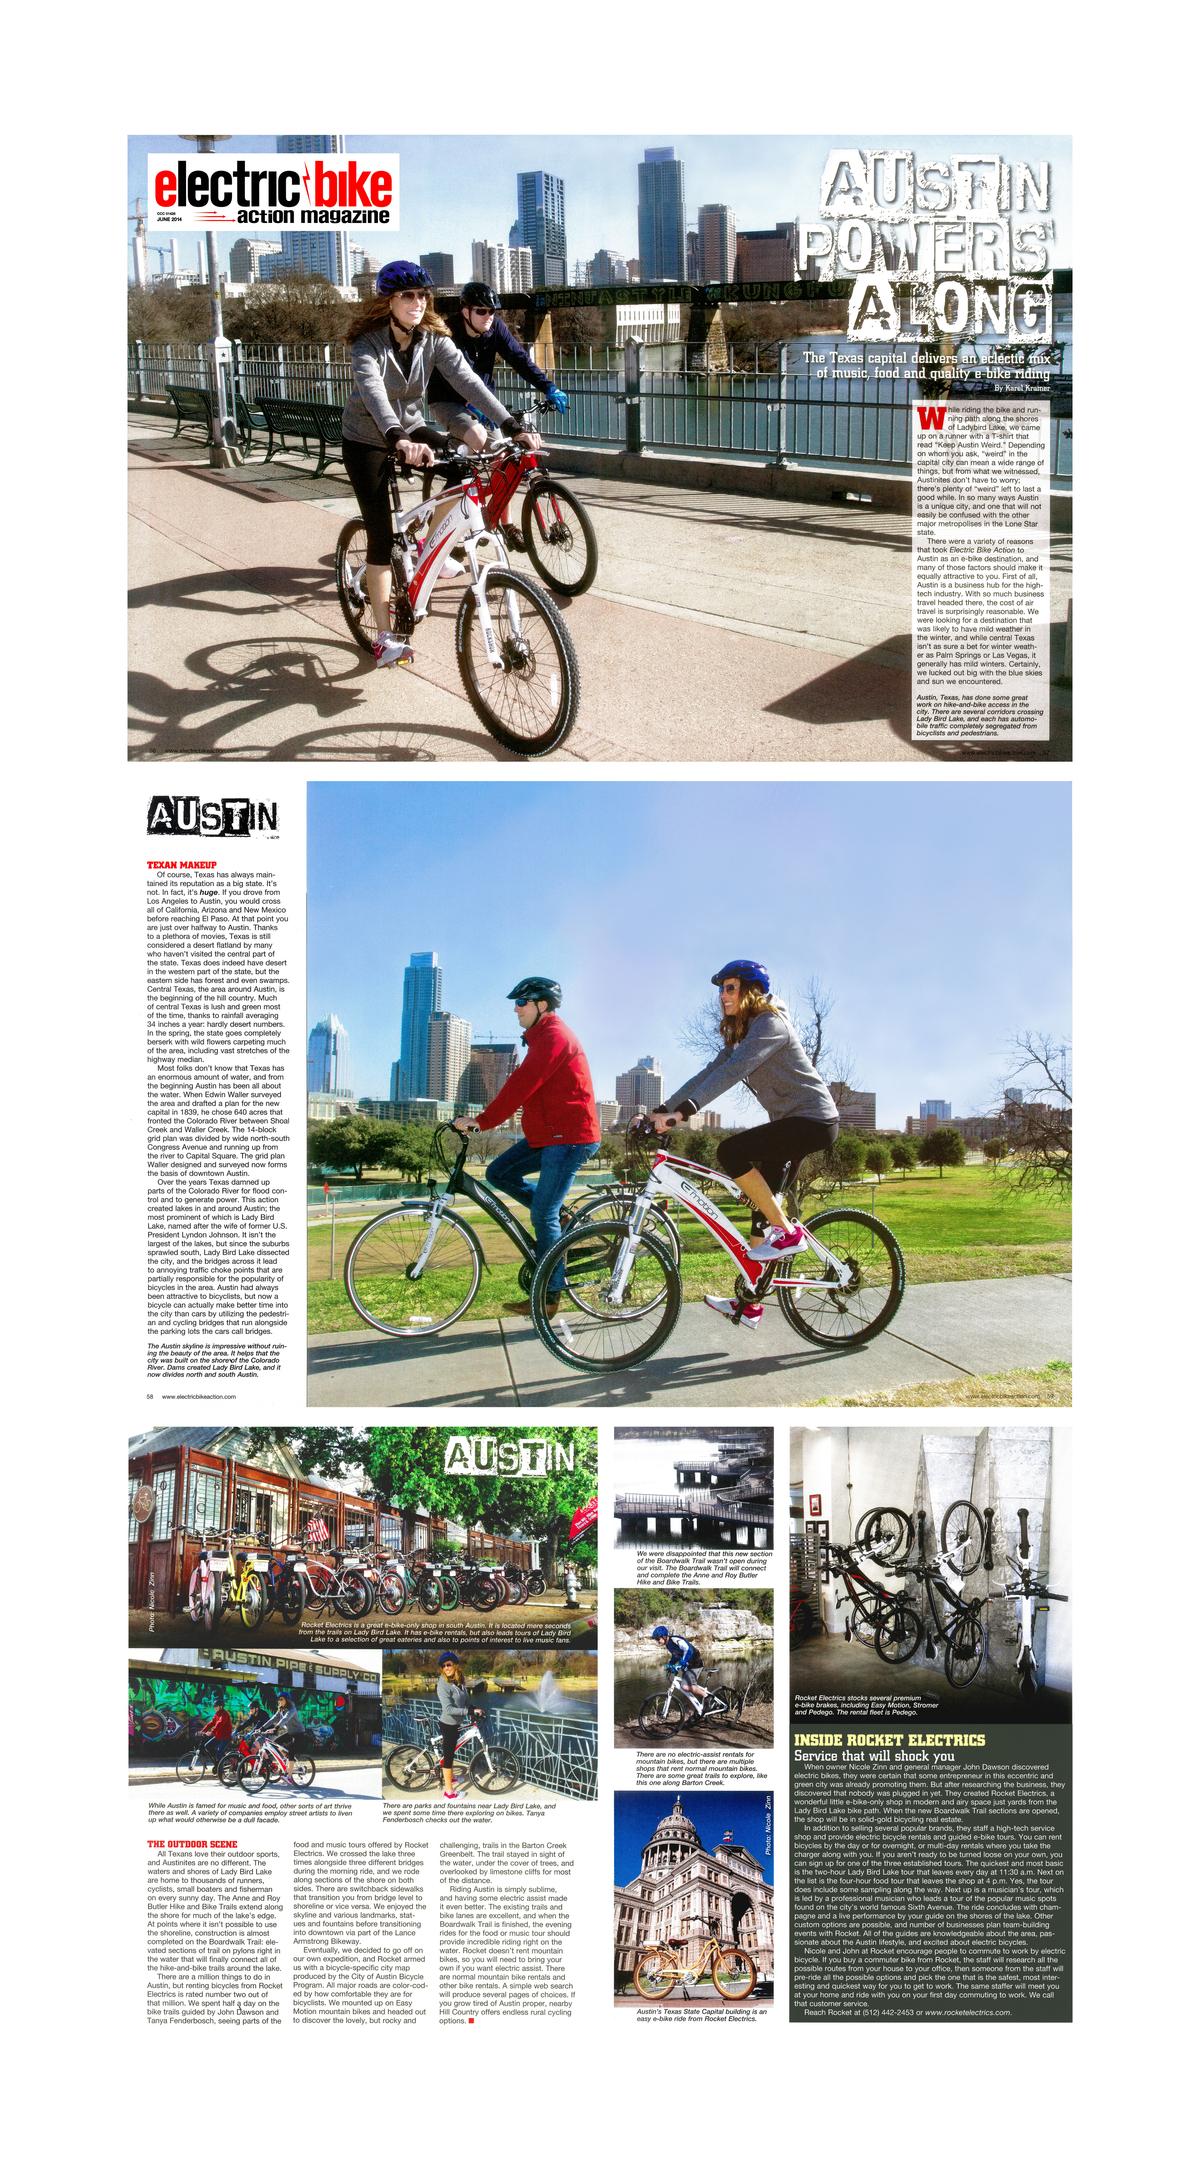 Electric Bike Magazine Rocket Electrics